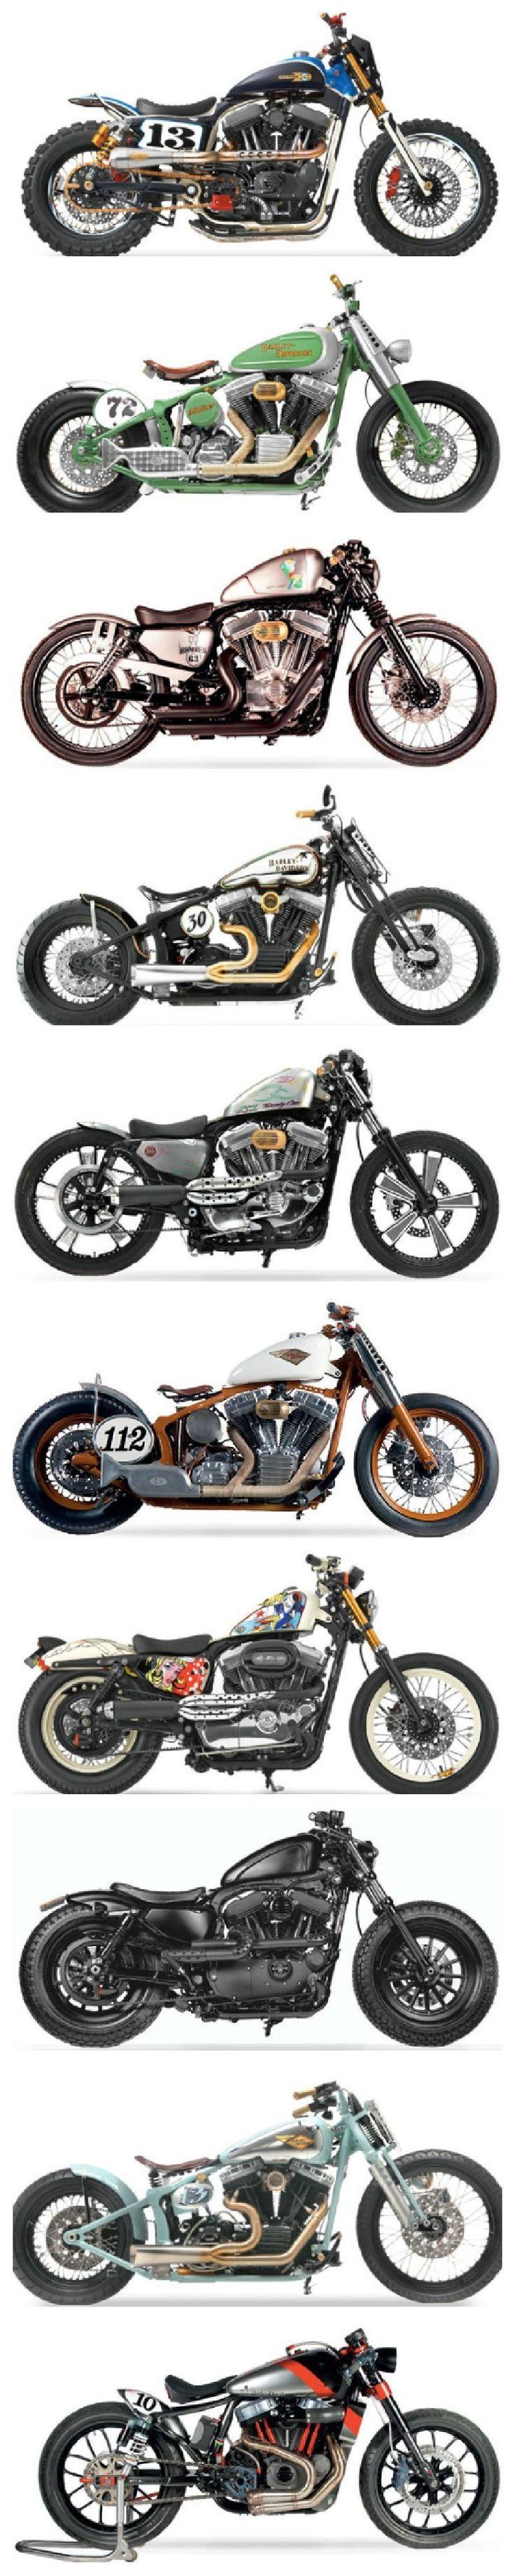 Road Legal Custom Harleys From Europe #harleydavidsoncustommotorcyclesclassiccars